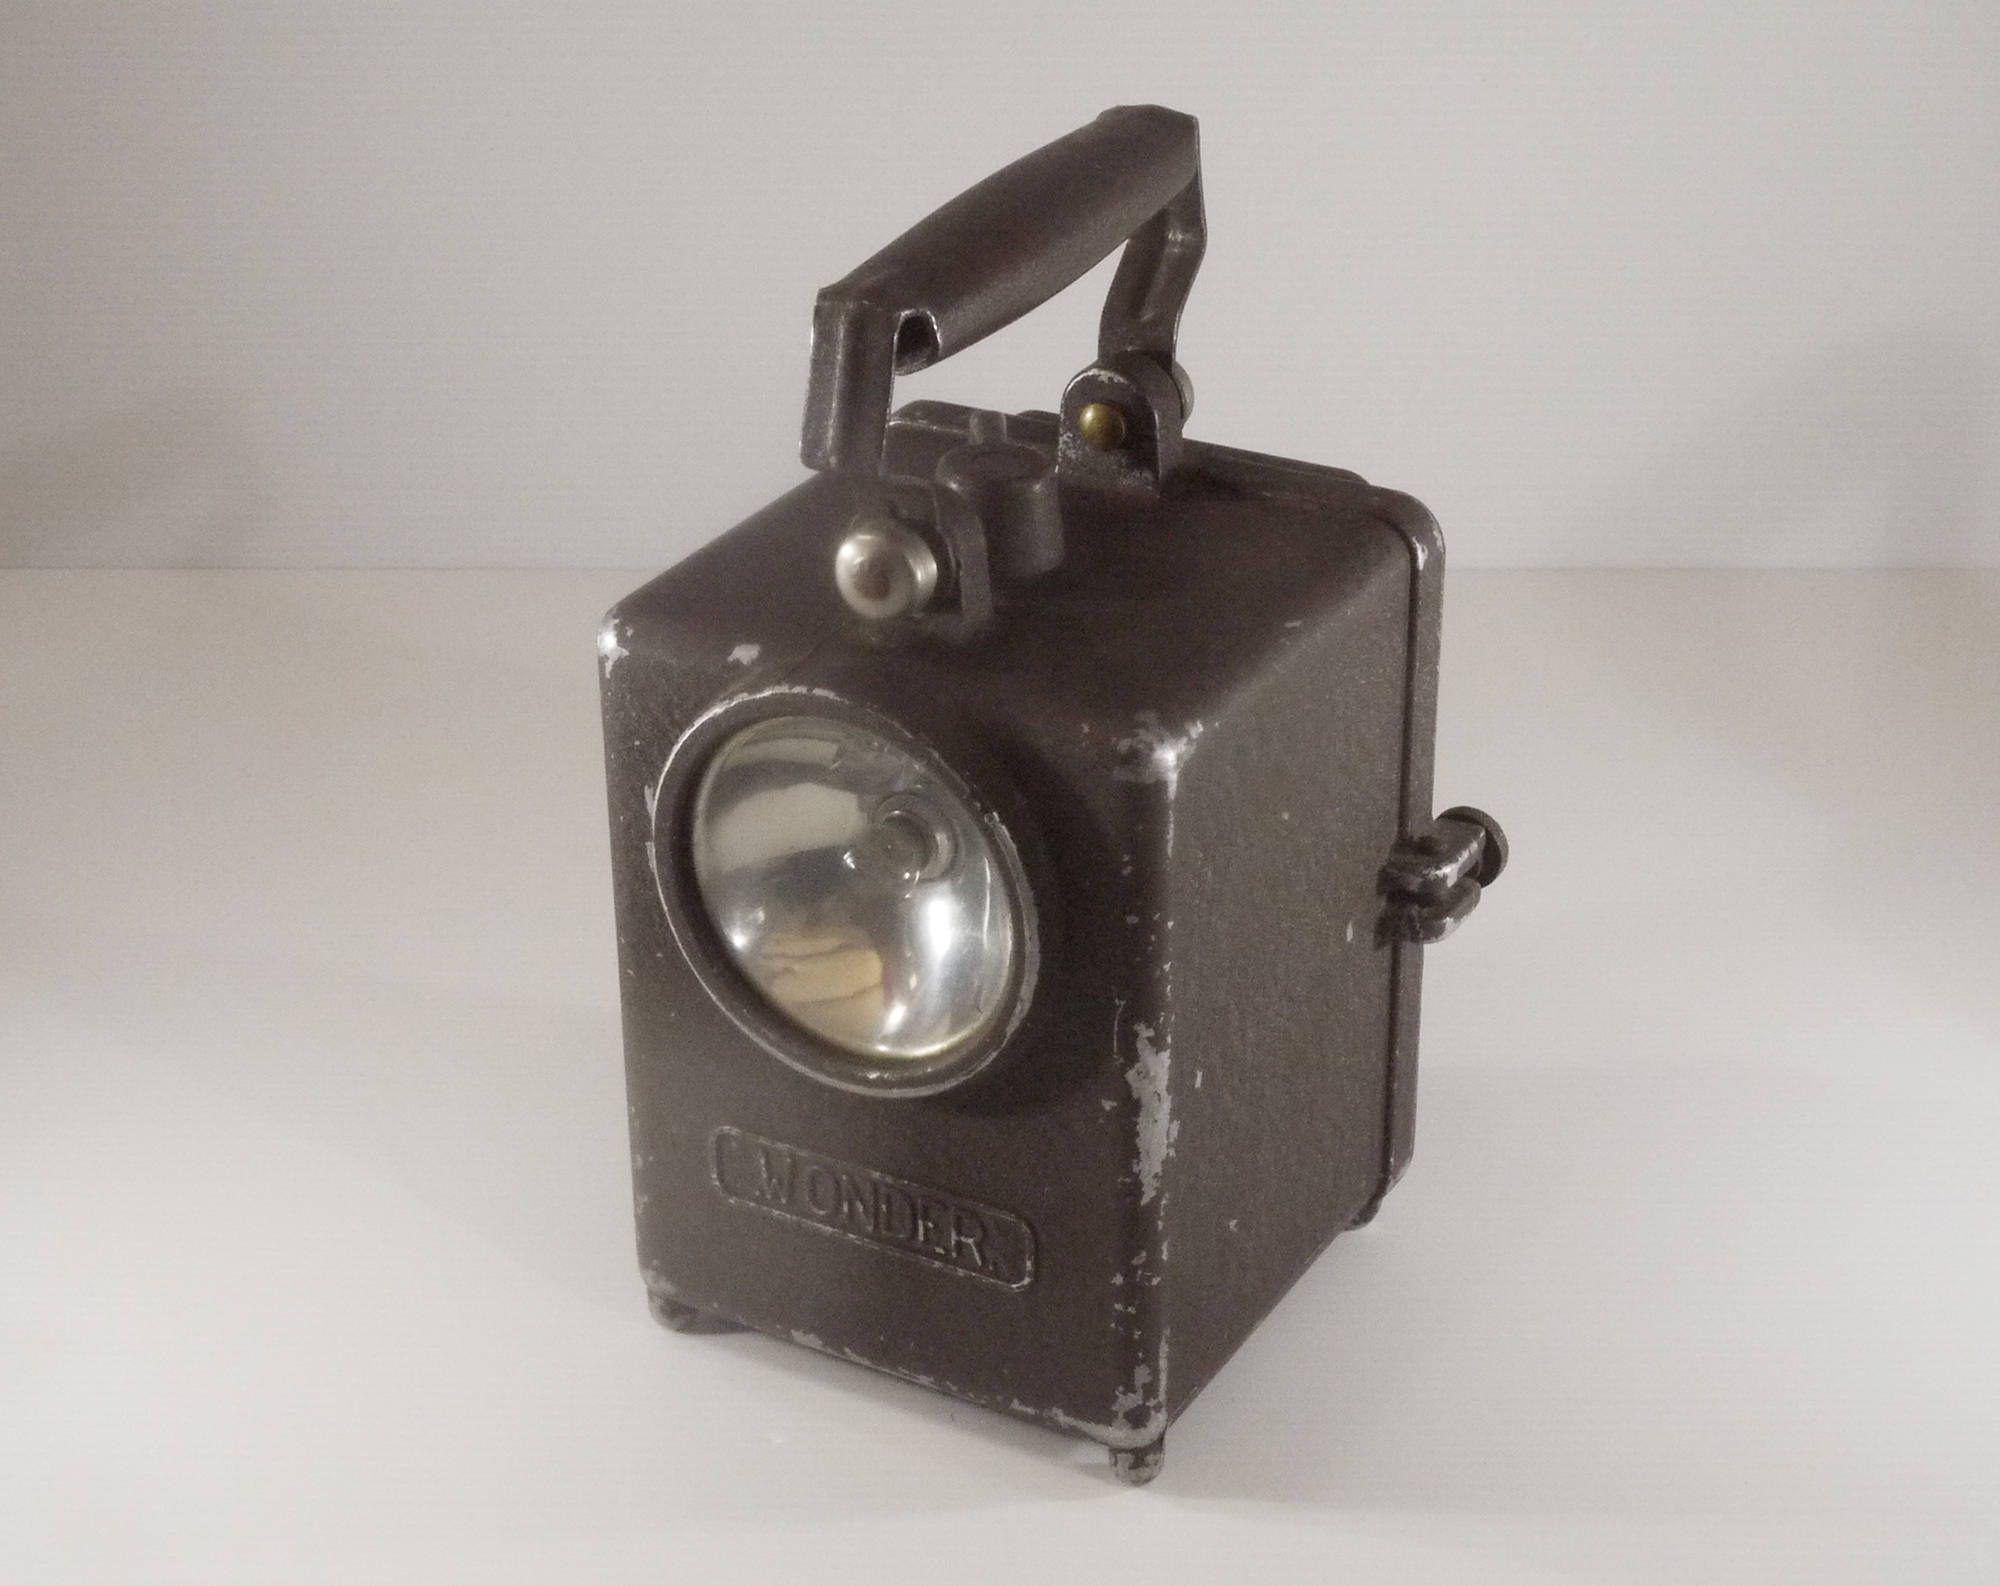 Vintage French Wonder Type Agral Industrial Railway Lamp Etsy Lampe De Poche Lanterne Lamp